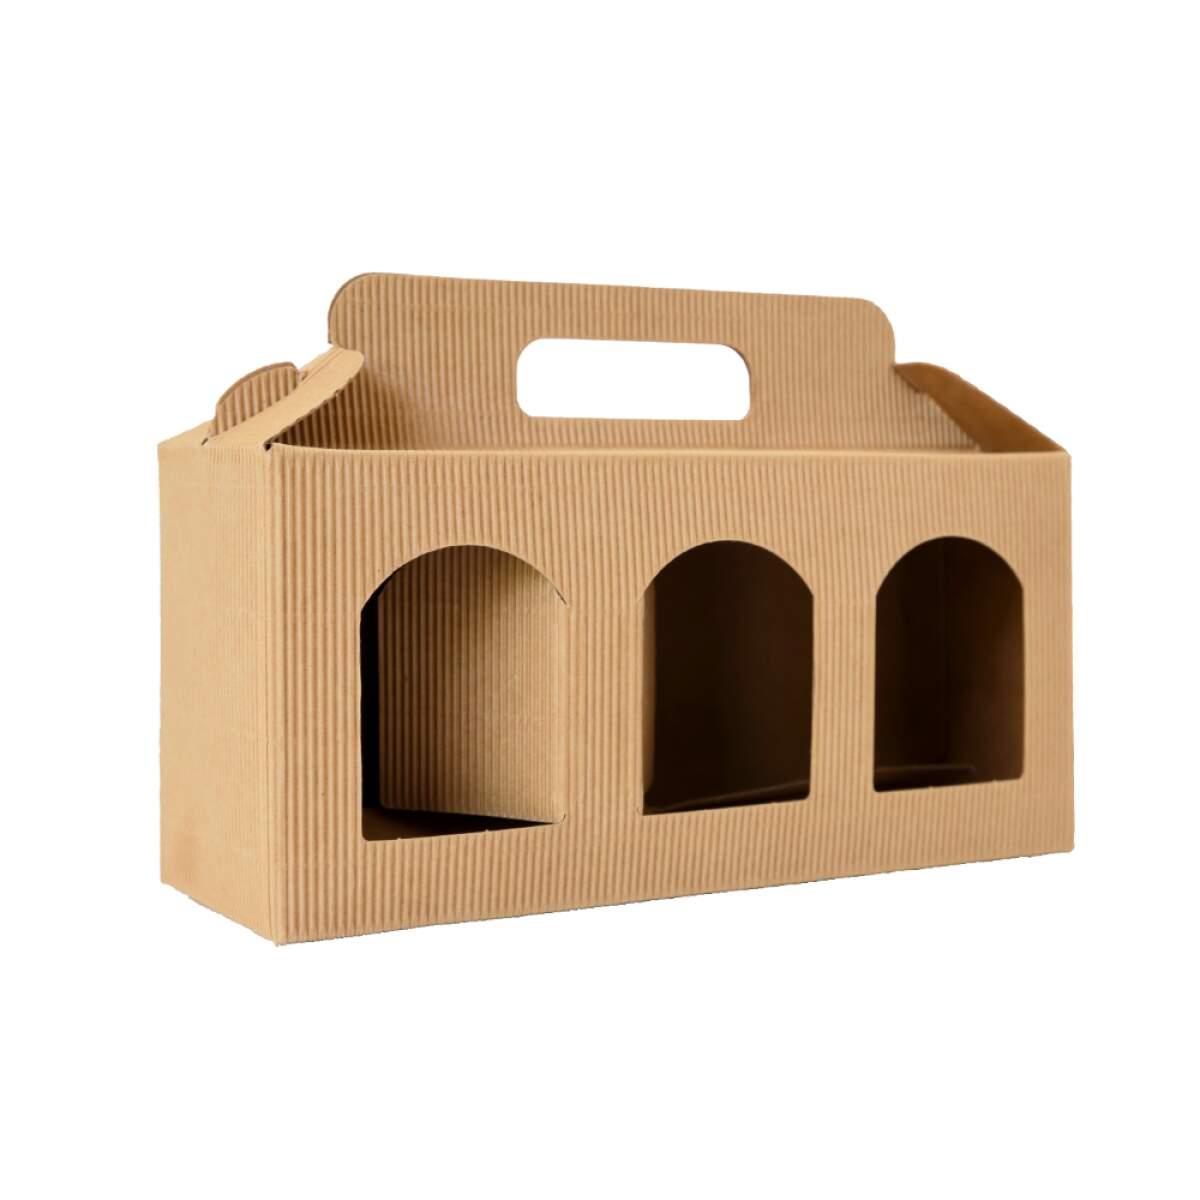 Box-Gr-L-Greenwood-m-3-Fenster-nature_2116_1000px